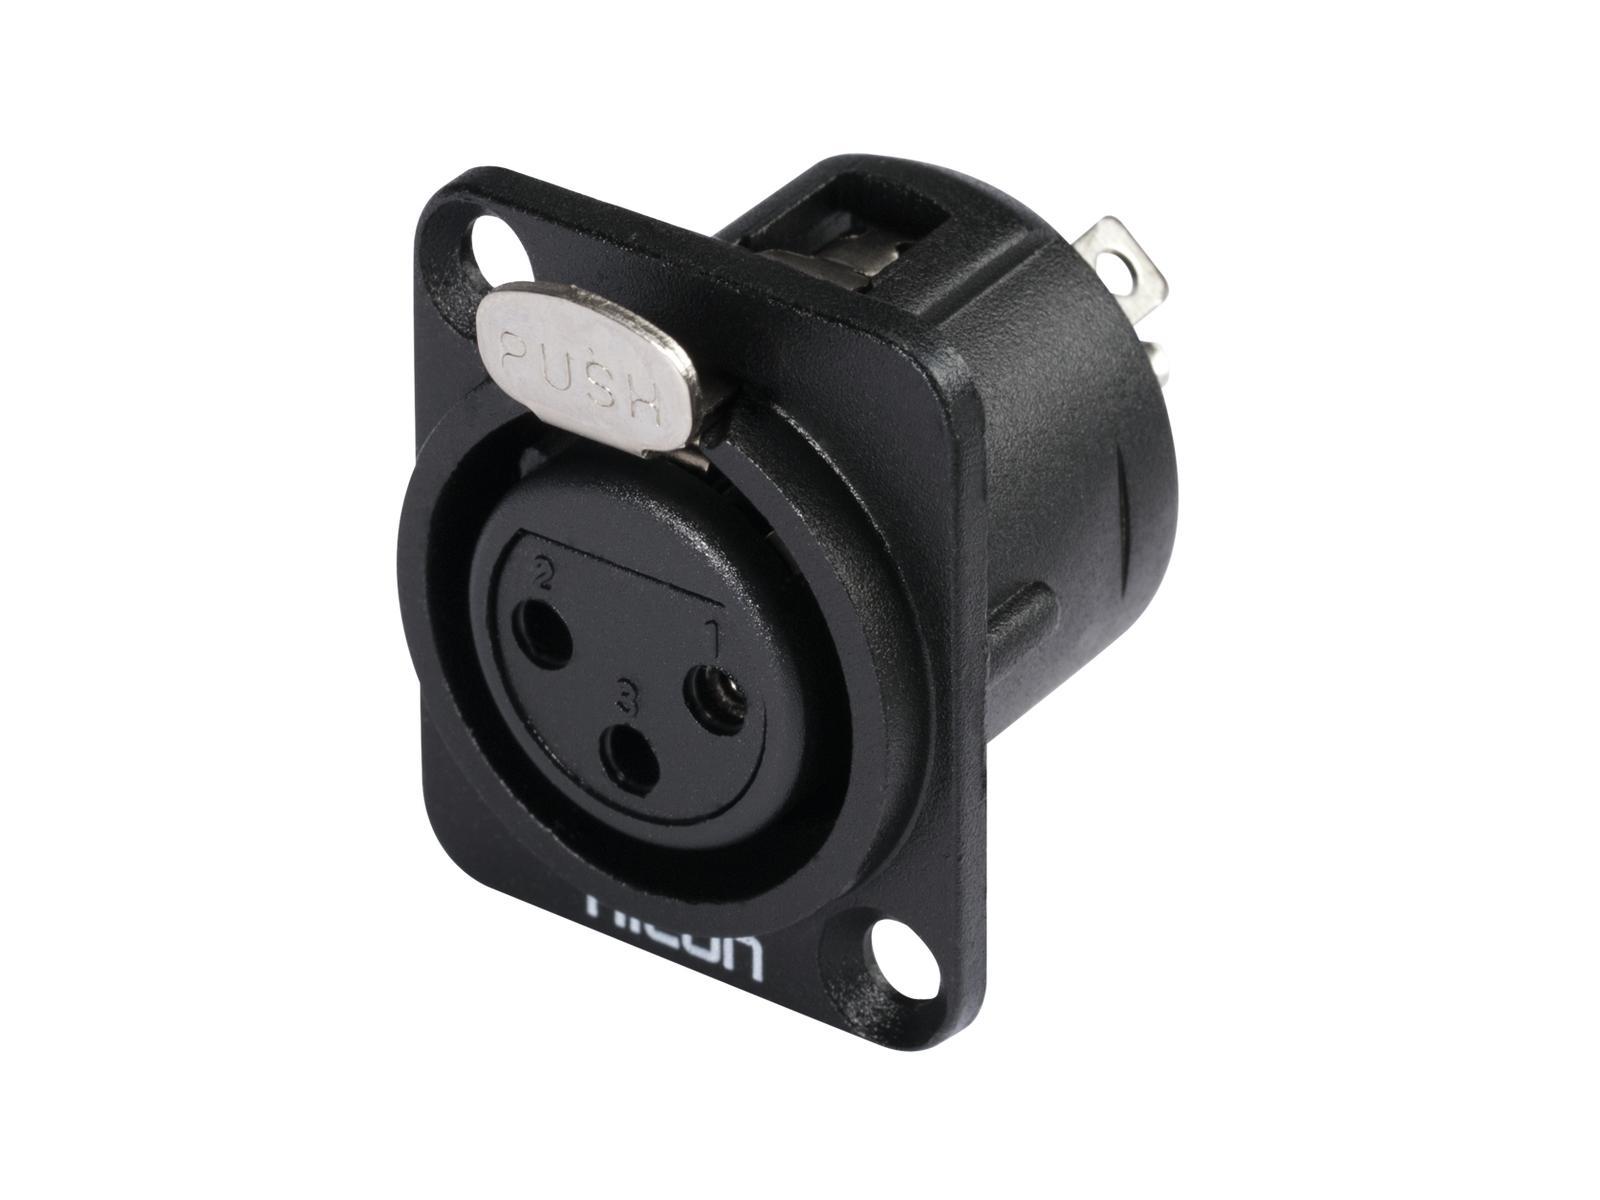 HICON XLR montaggio plug 3pin HI-X3DF-G